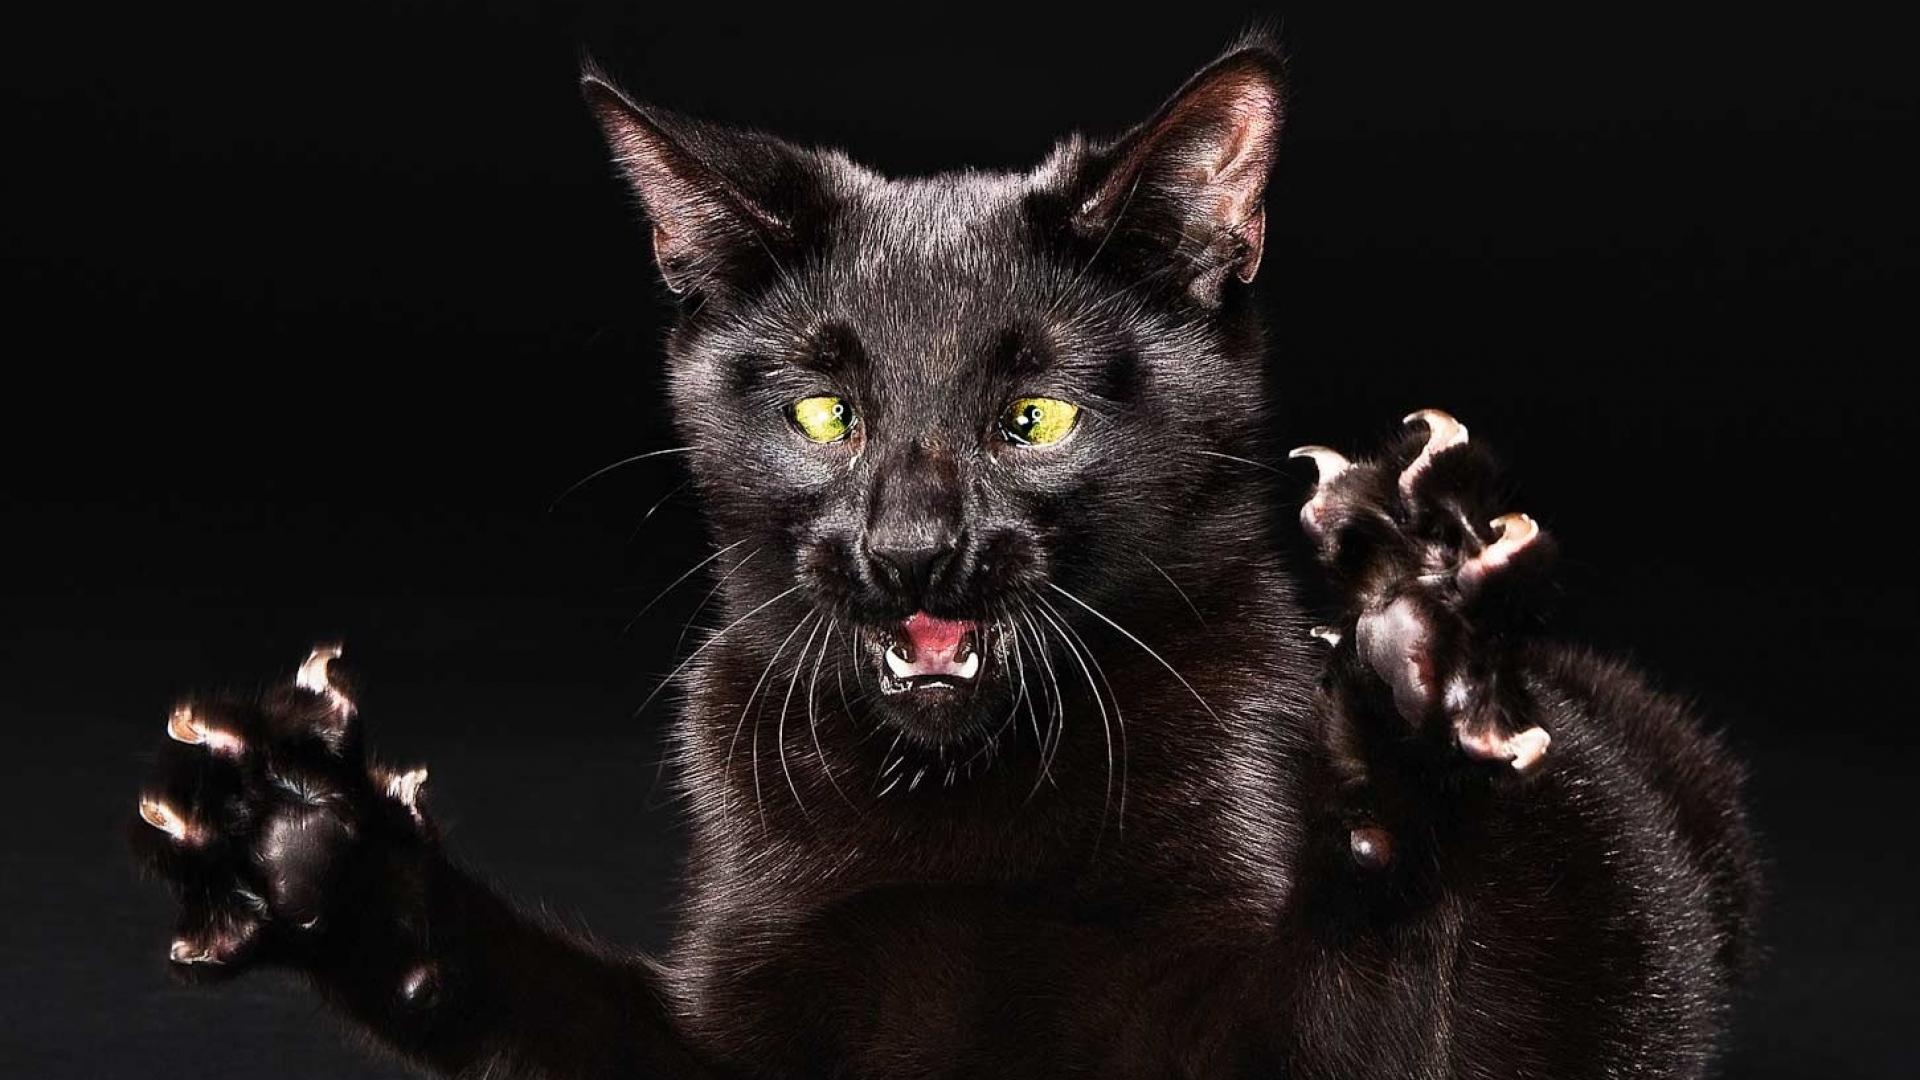 Download Wallpaper 1920x1080 Cat Funny Black Legs Full HD 1080p